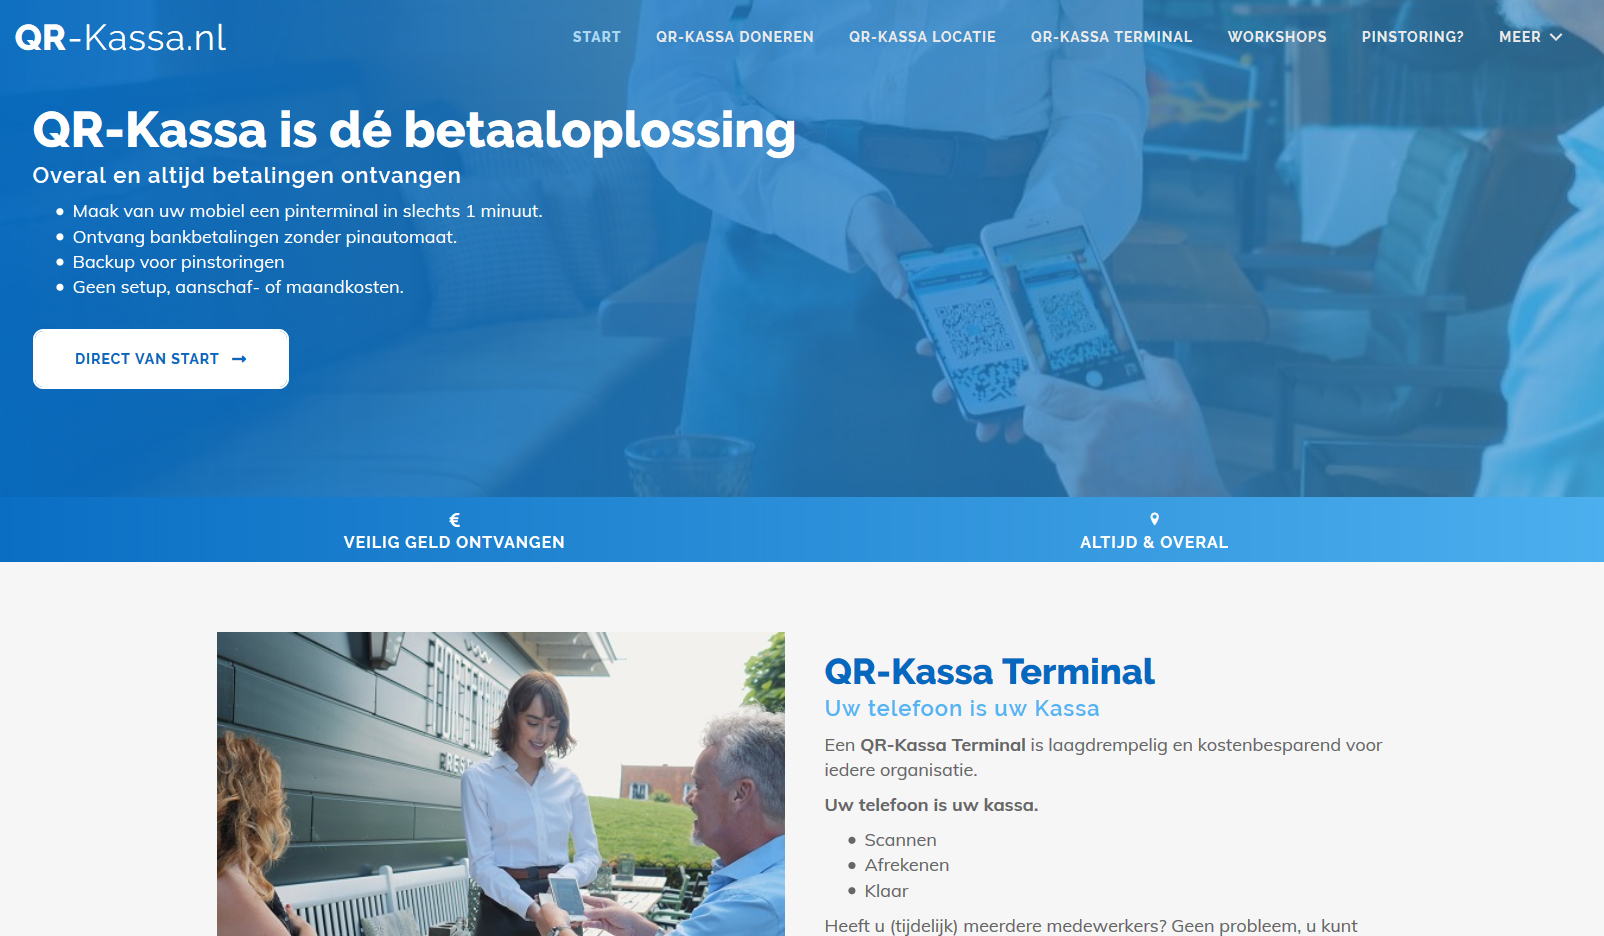 QR-Kassa.nl